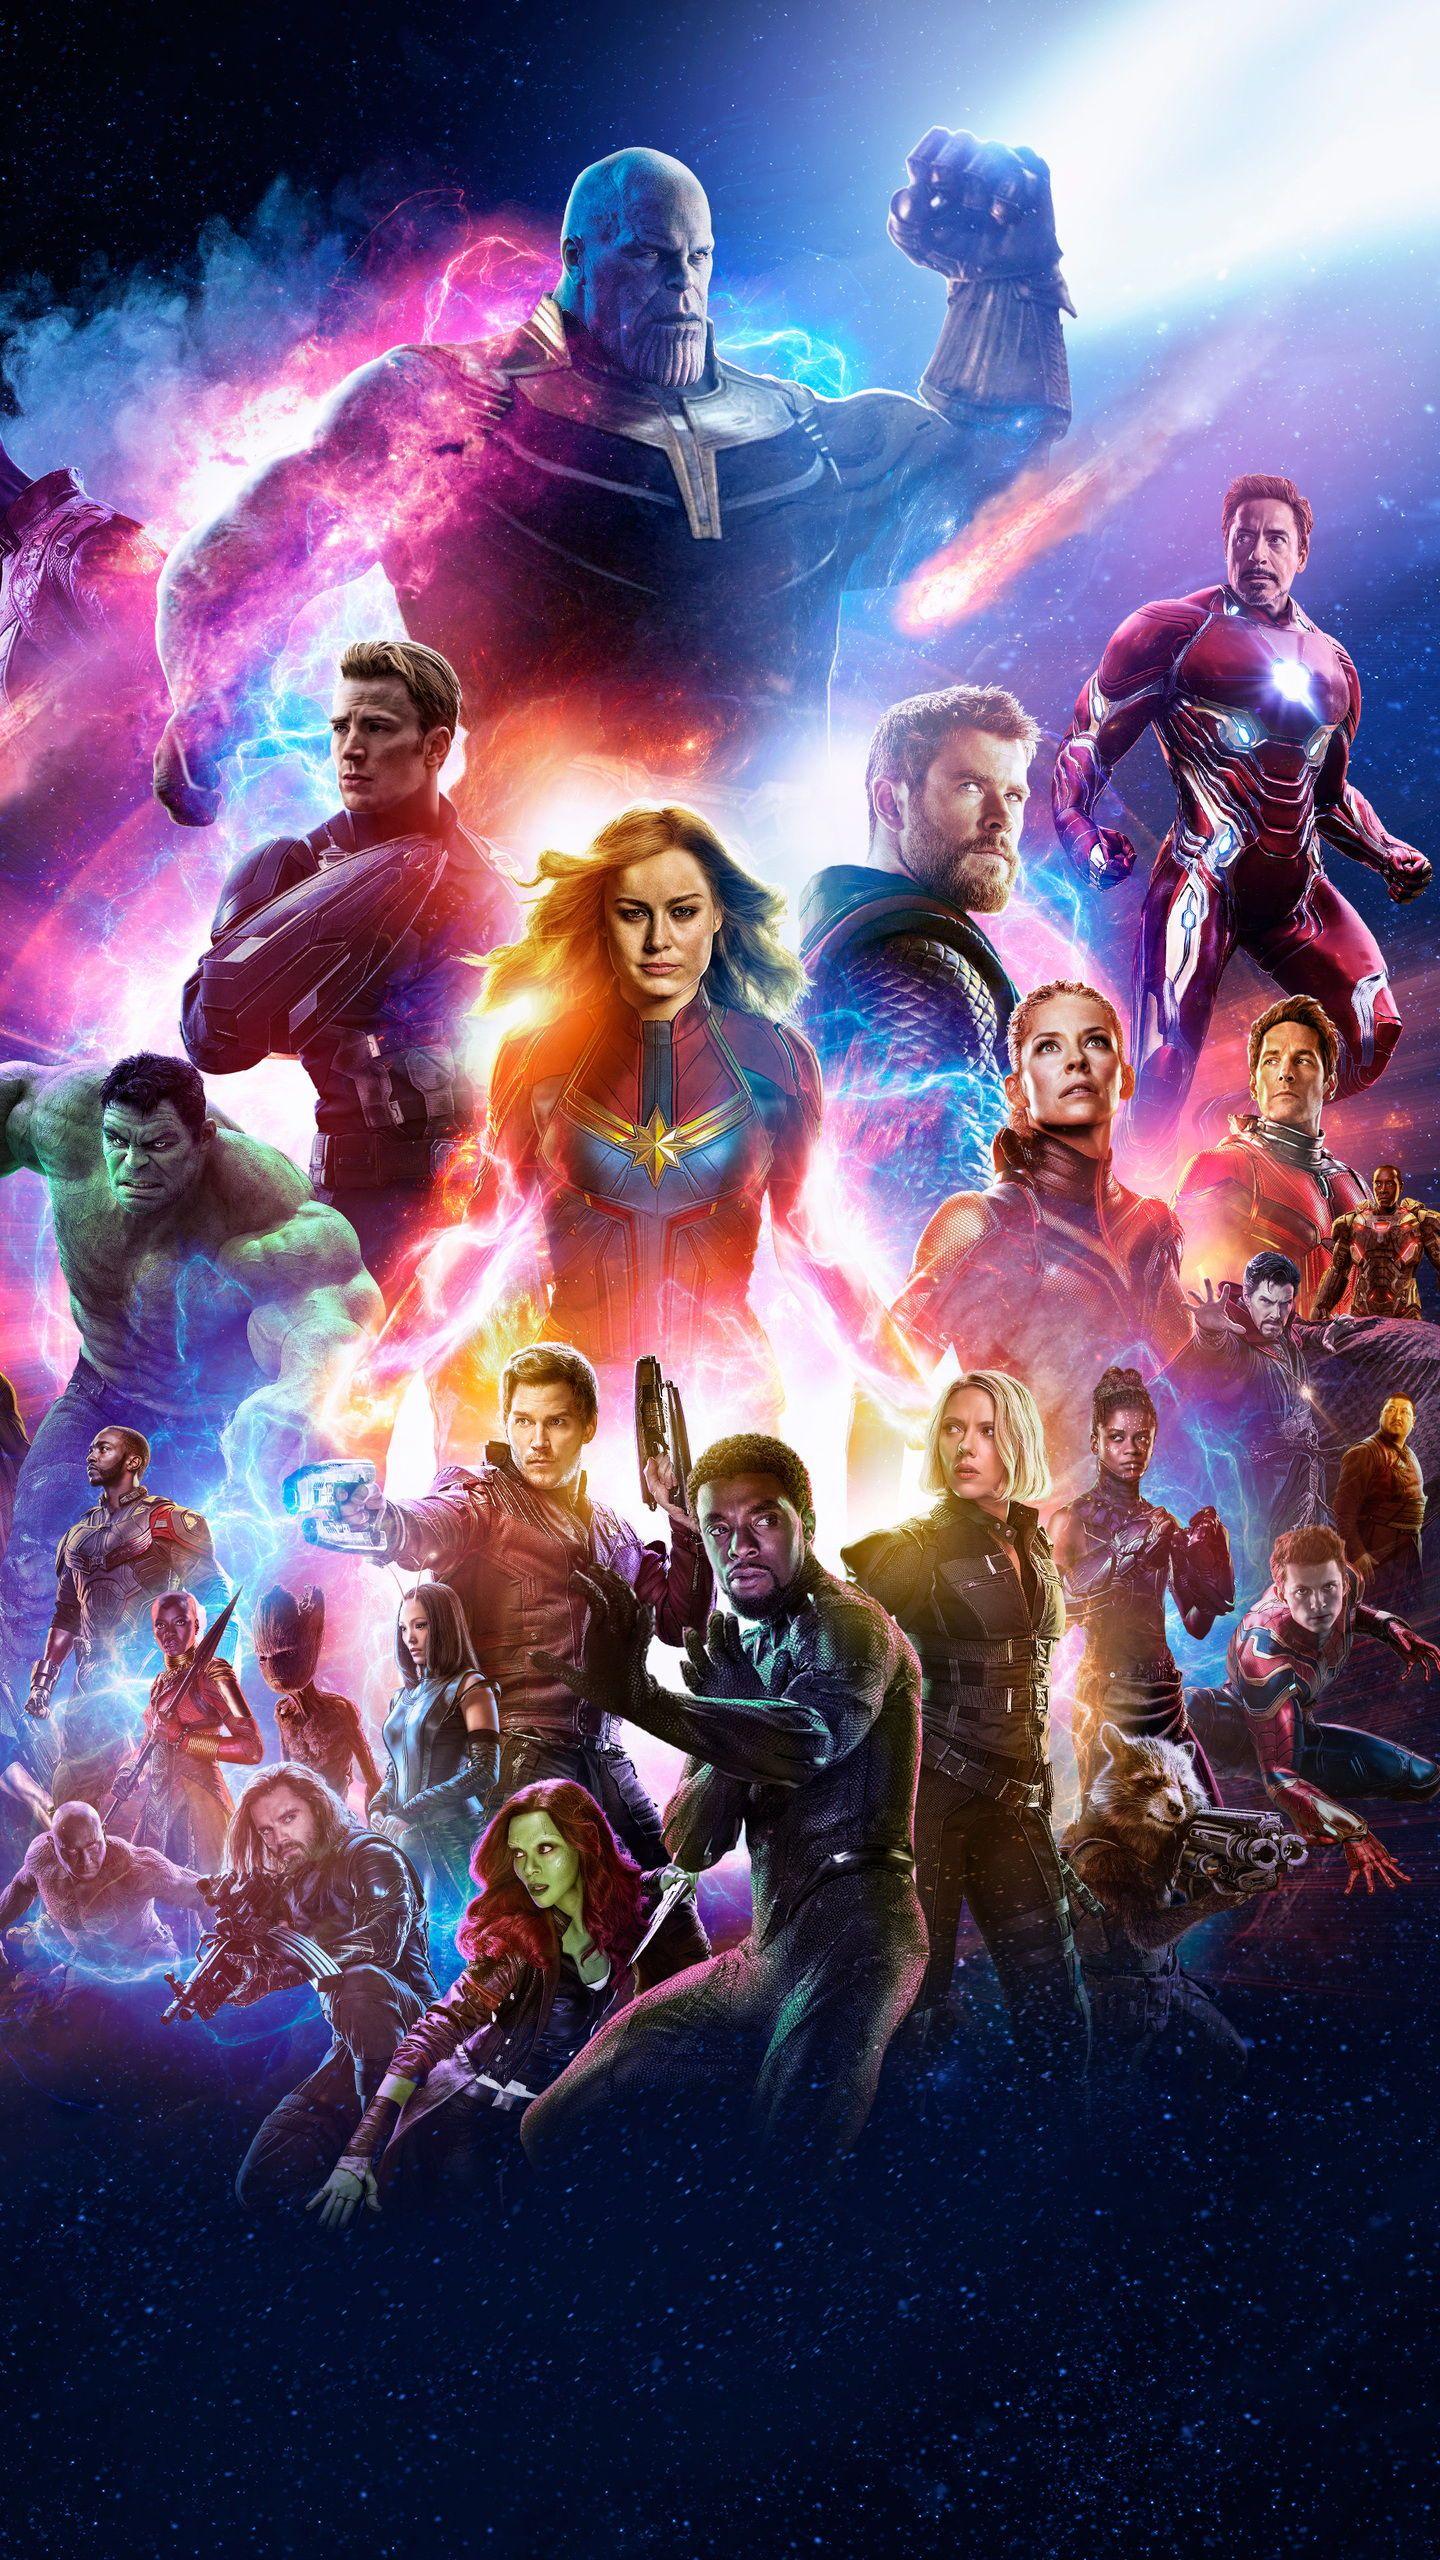 Download Hd Wallpapers Follow Wallpaper Hook To Download Avengers Avengers Endgame Marvel Cinematic Univer Avengers Fondo De Pantalla De Avengers Marvel